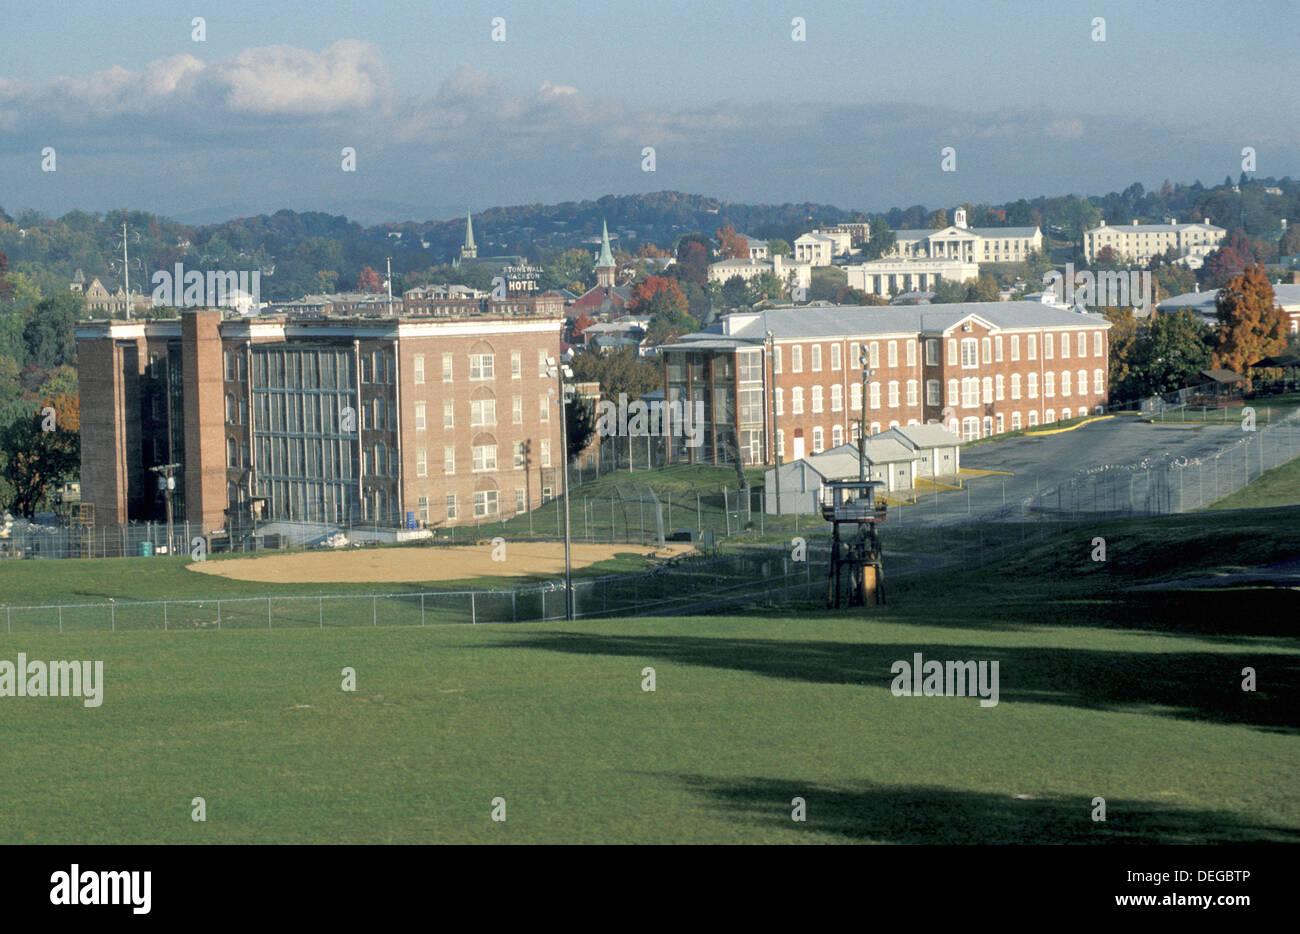 Parison facility. Staunton, Virginia. USA. - Stock Image